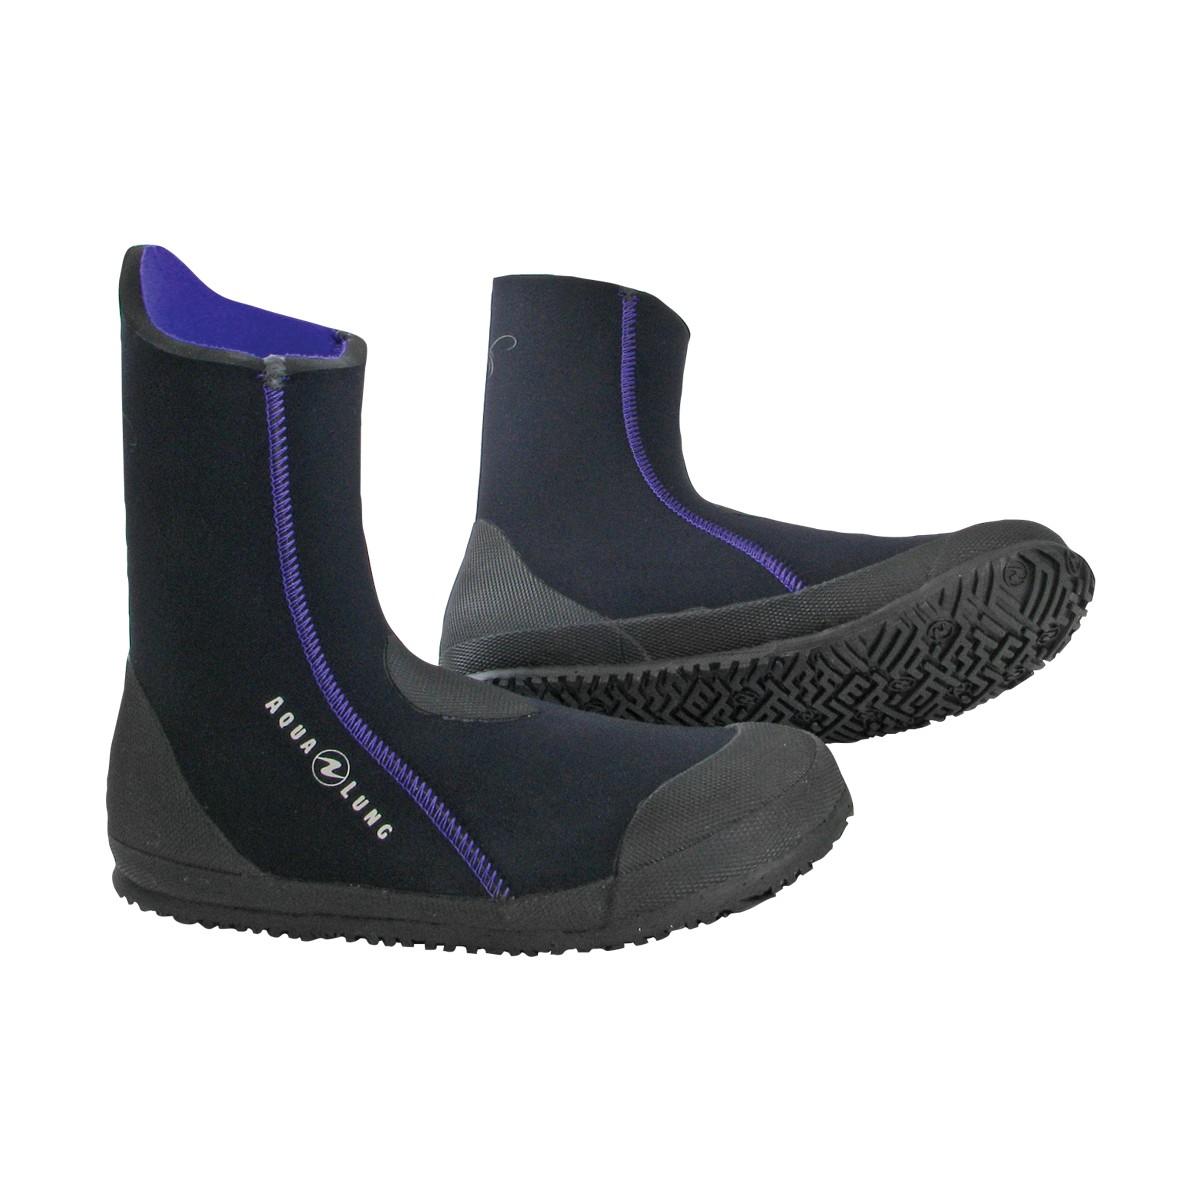 Aqua Lung Women's 7mm Ellie Ergo Boot